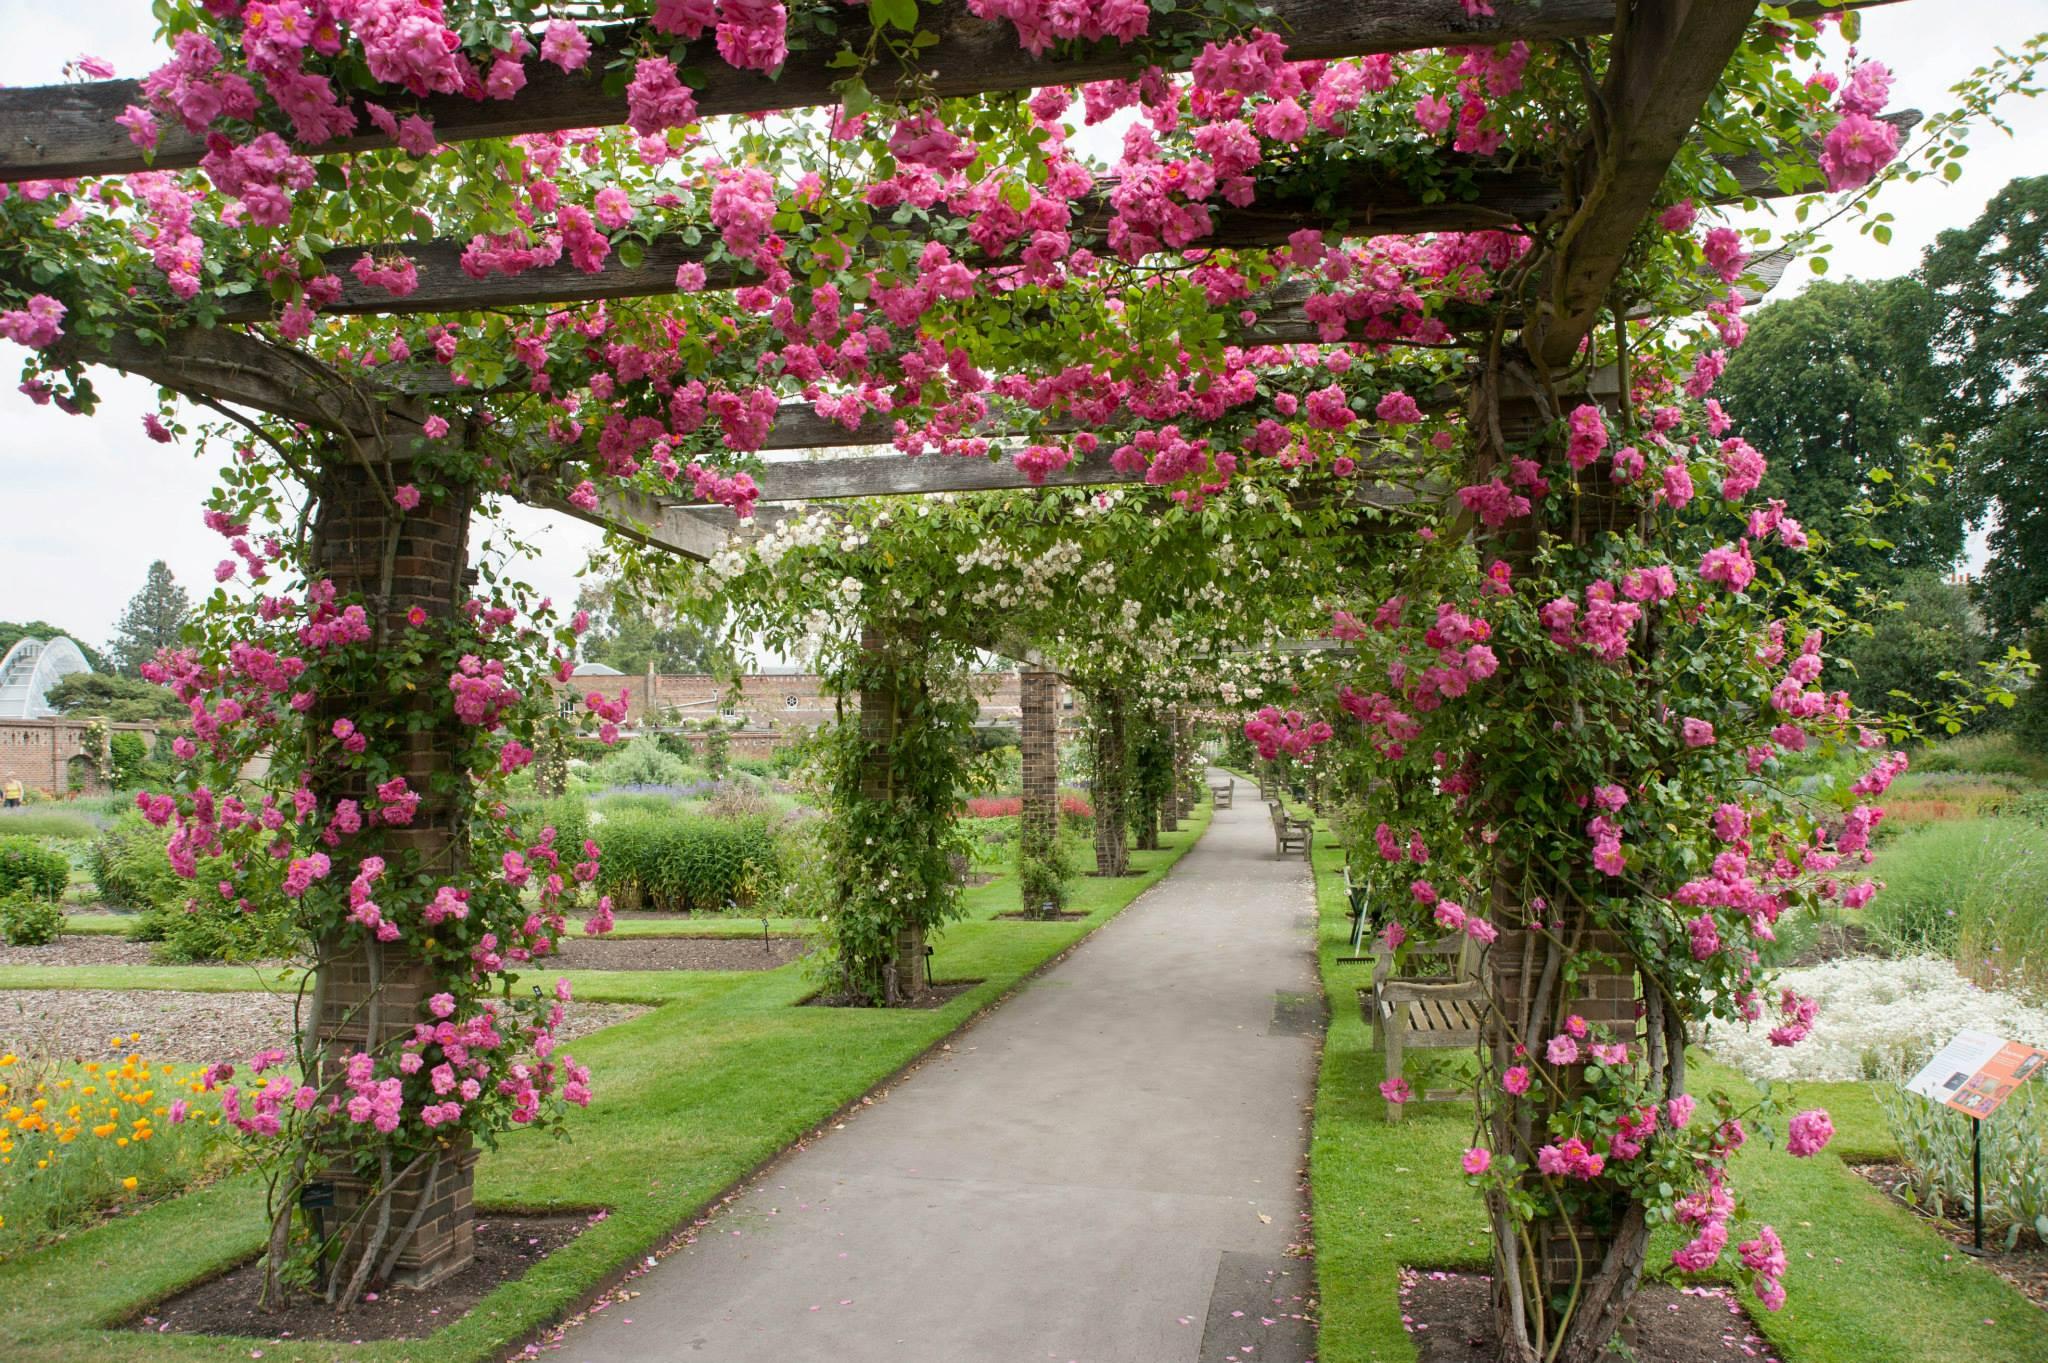 De rozen van kew gardens tuinenstruinen org - Eigentijds pergola design ...